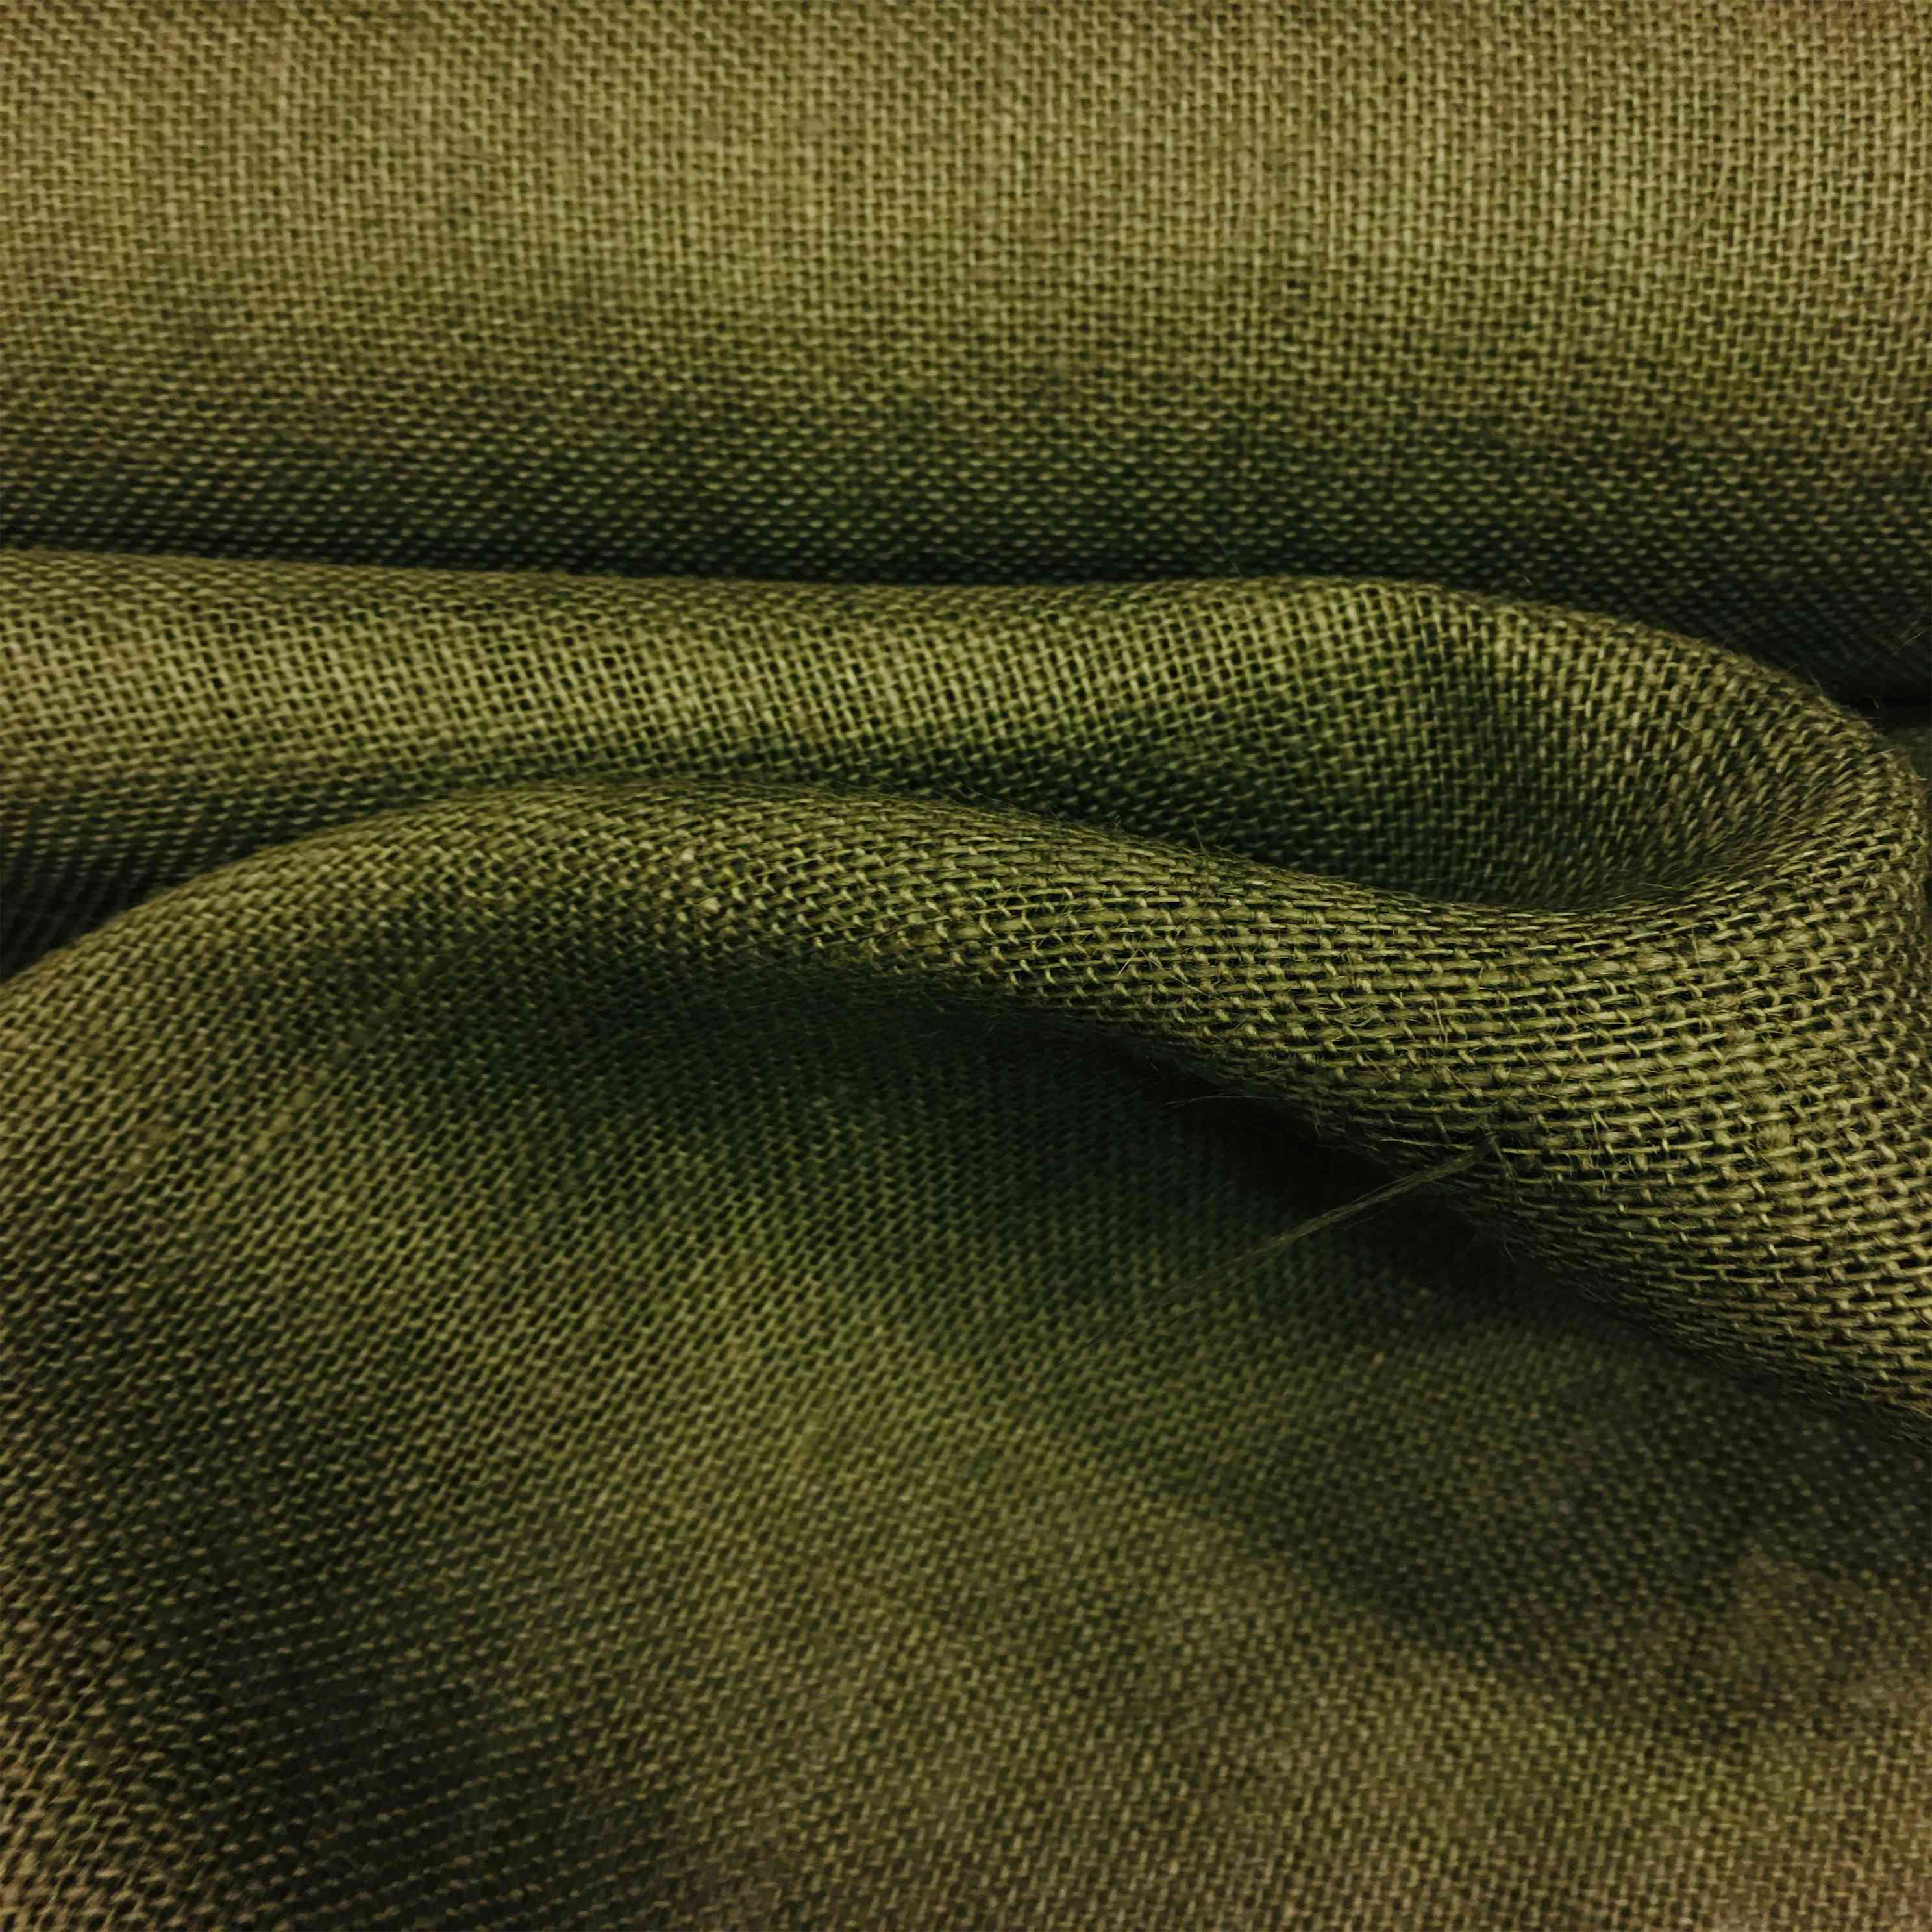 tissu toile de jute kaki tissus lionel. Black Bedroom Furniture Sets. Home Design Ideas